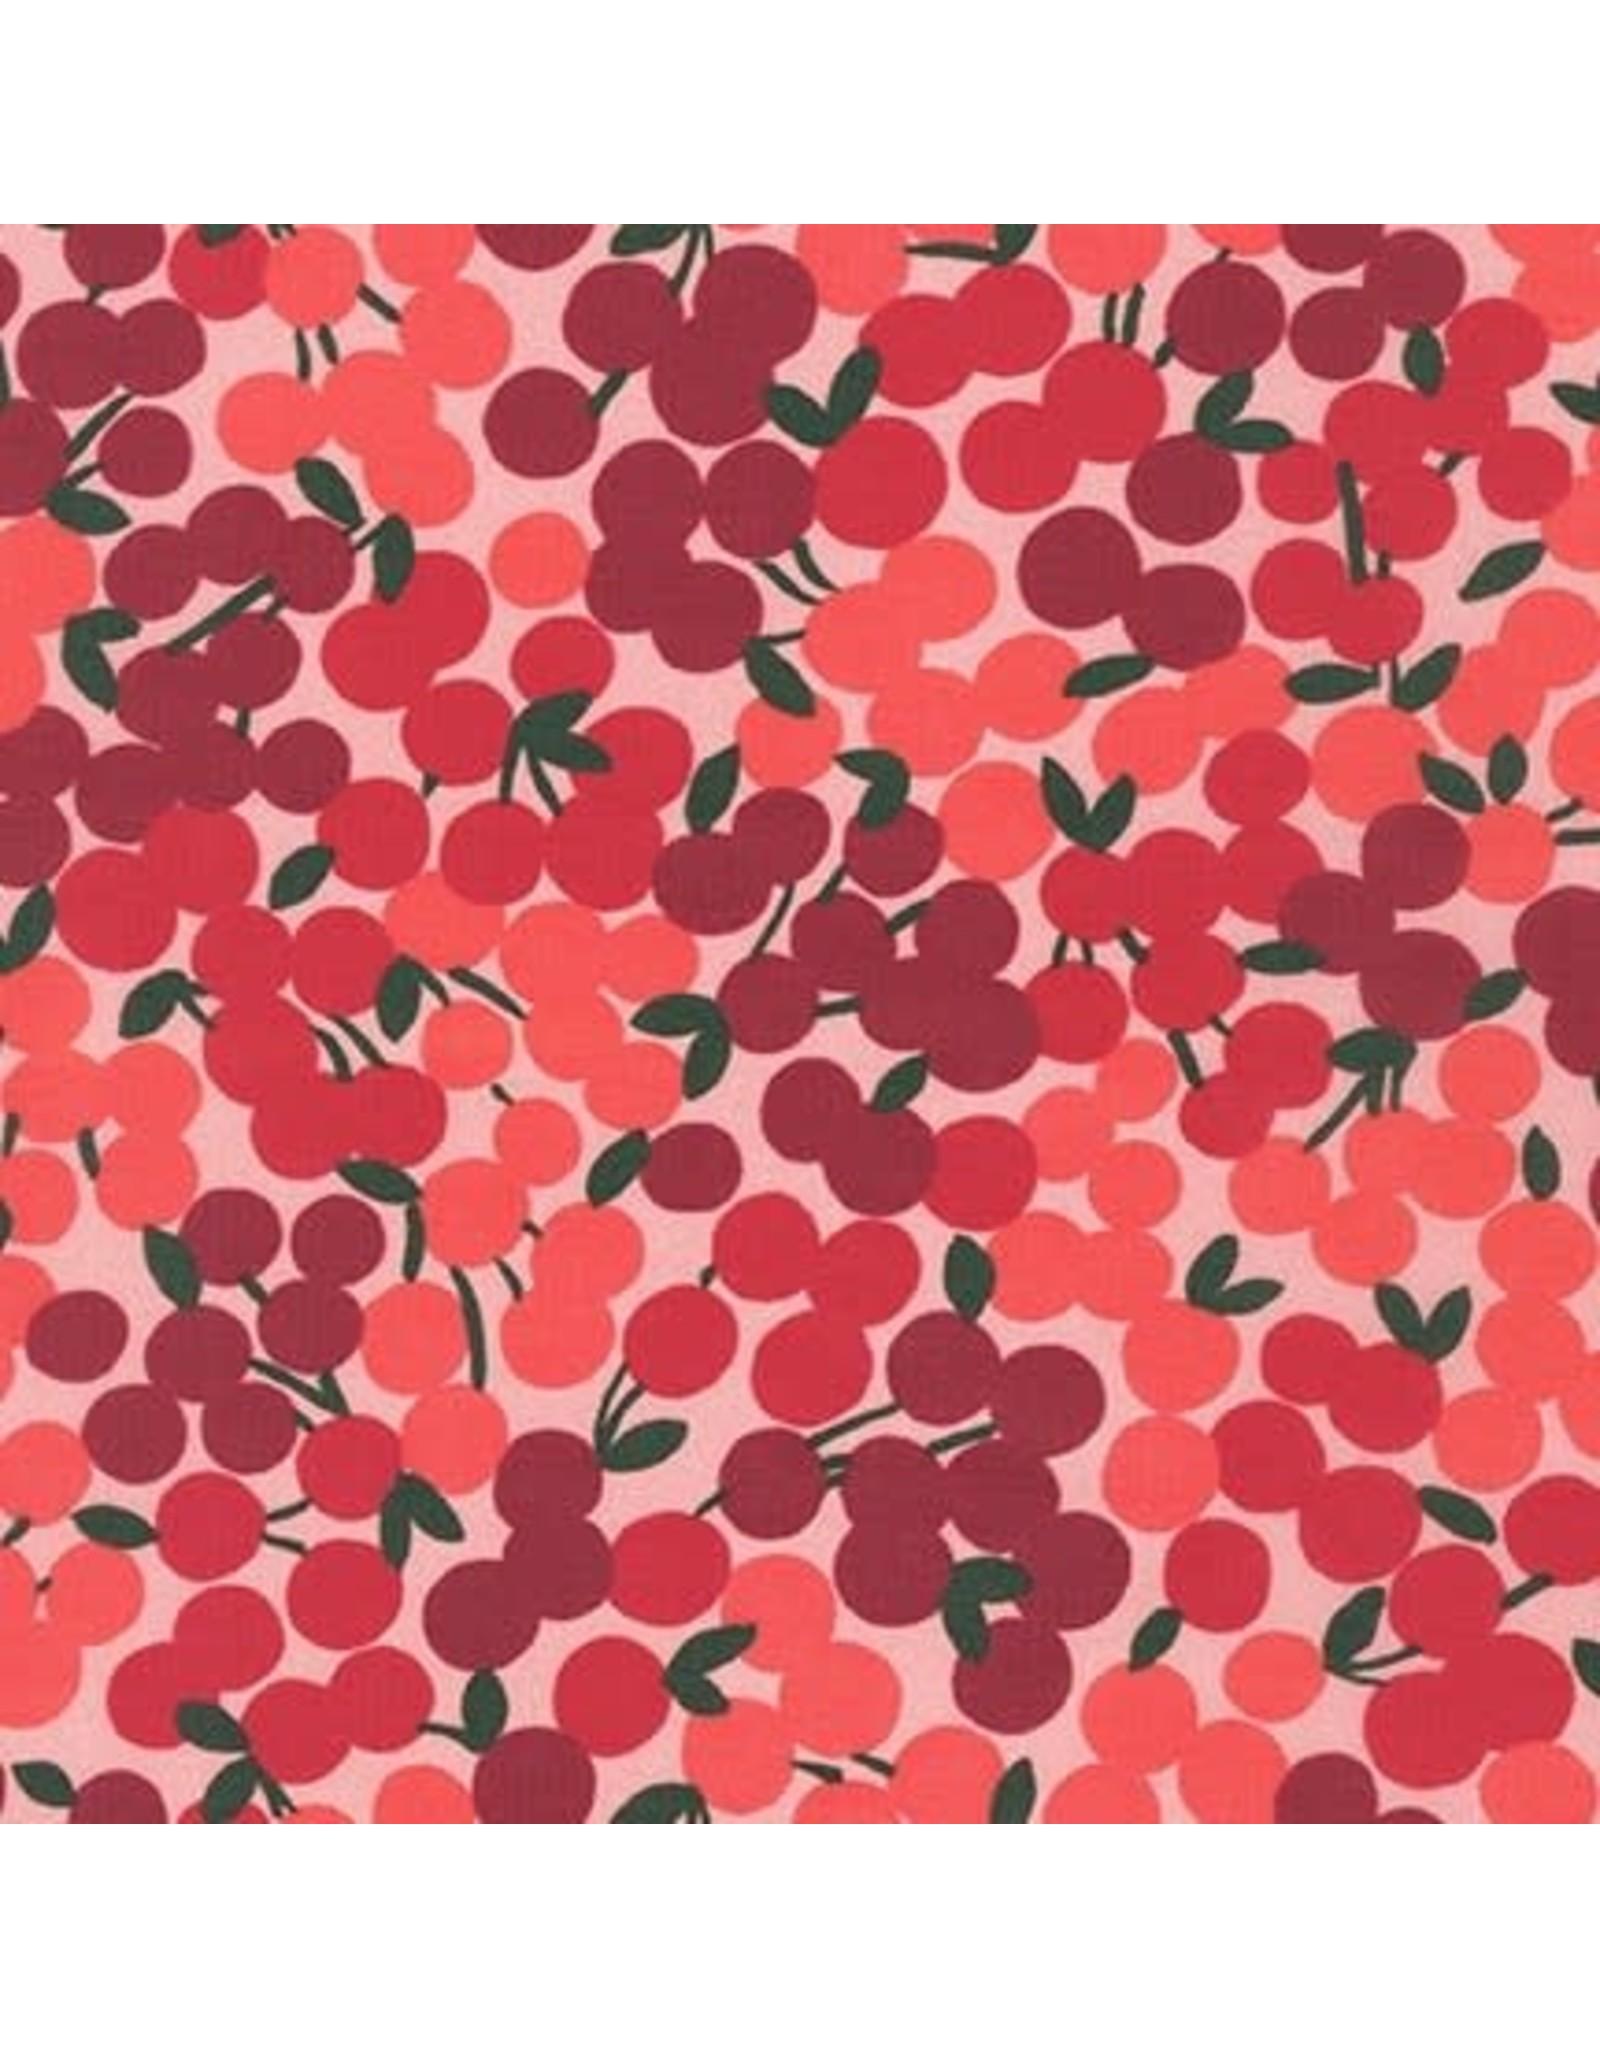 Robert Kaufman Cotton Lawn, Wishwell Cheery Blossoms in Cherry, Fabric Half-Yards